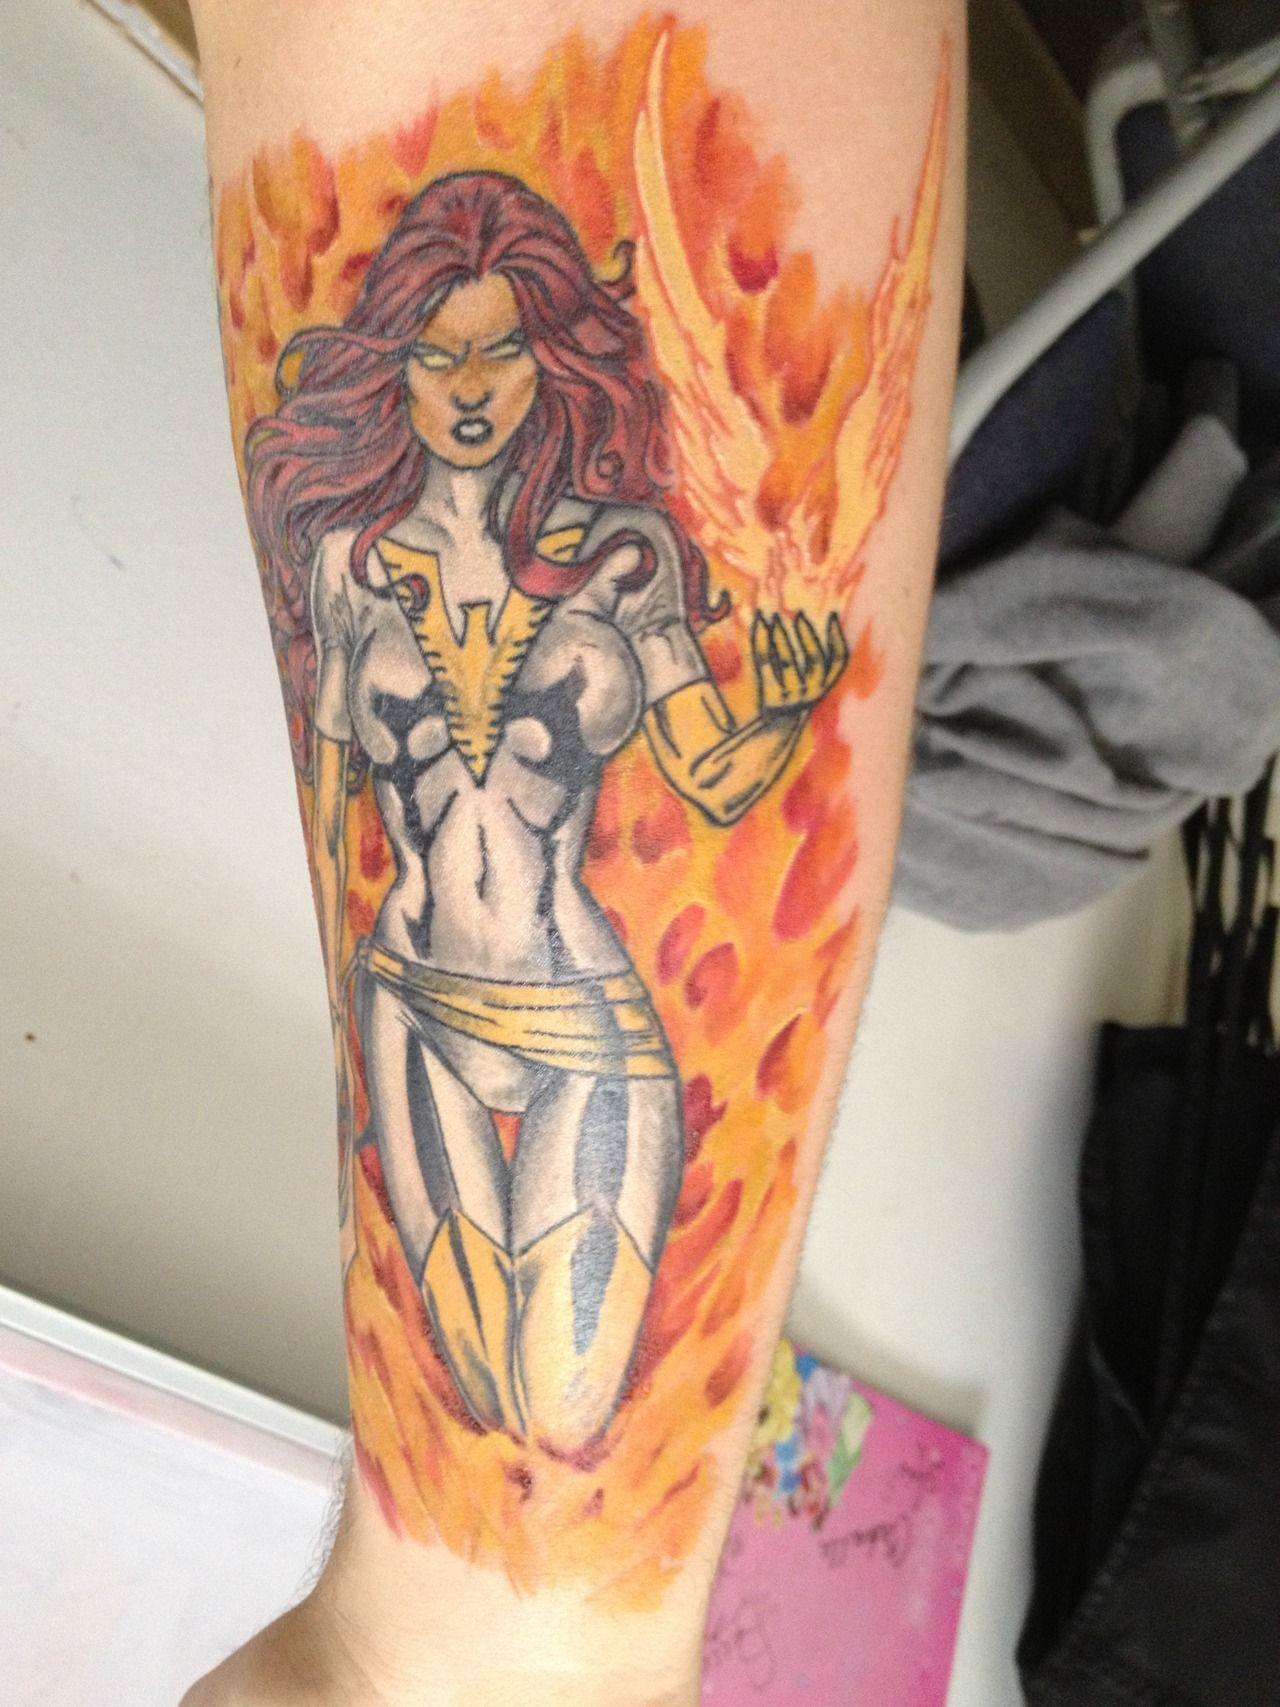 X Men Sleeve Jean Grey As White Phoenix Of The Crown Tattoo Ideas